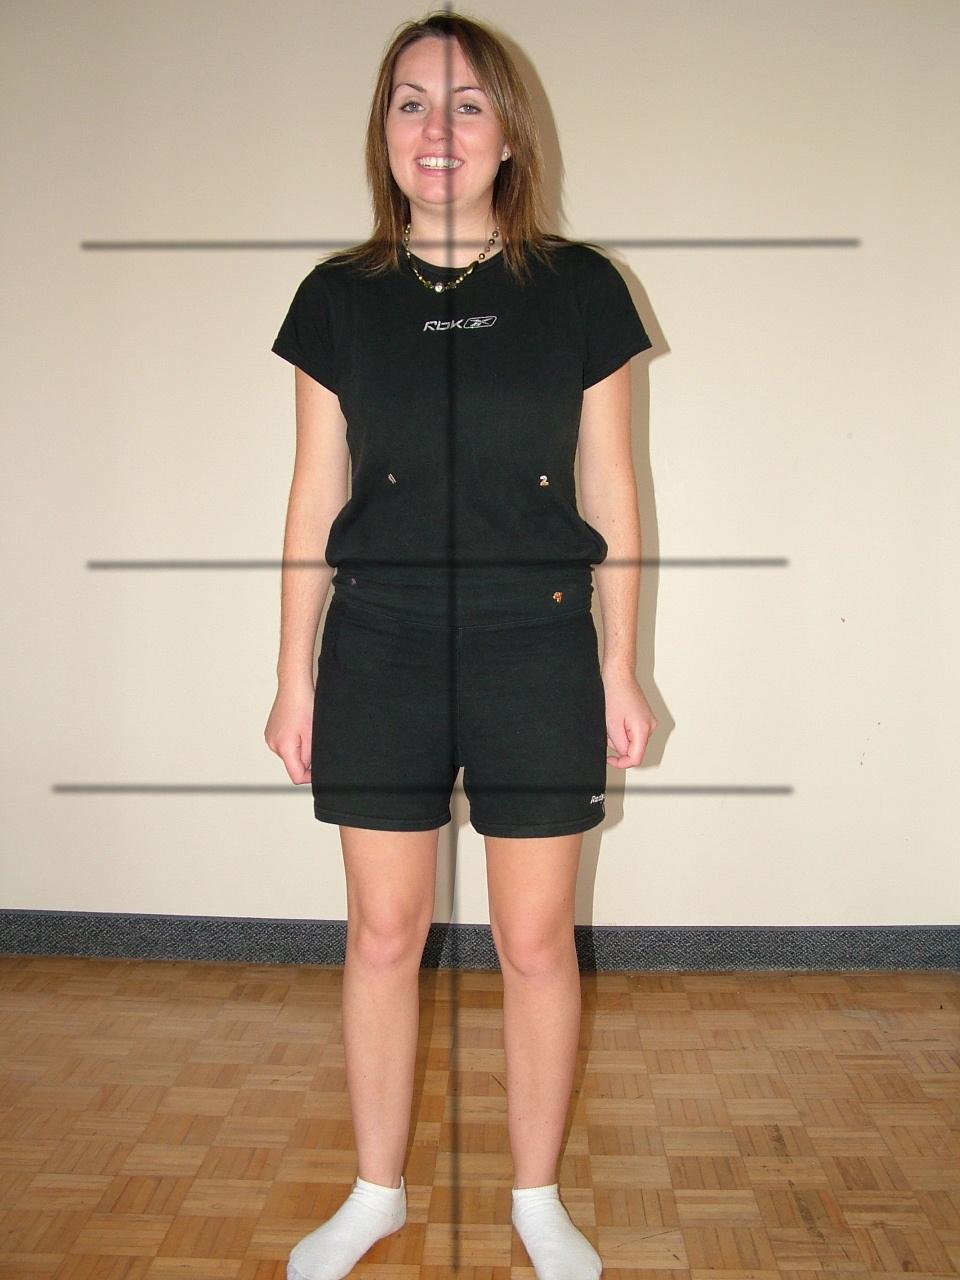 Krystal G nee H front view posture